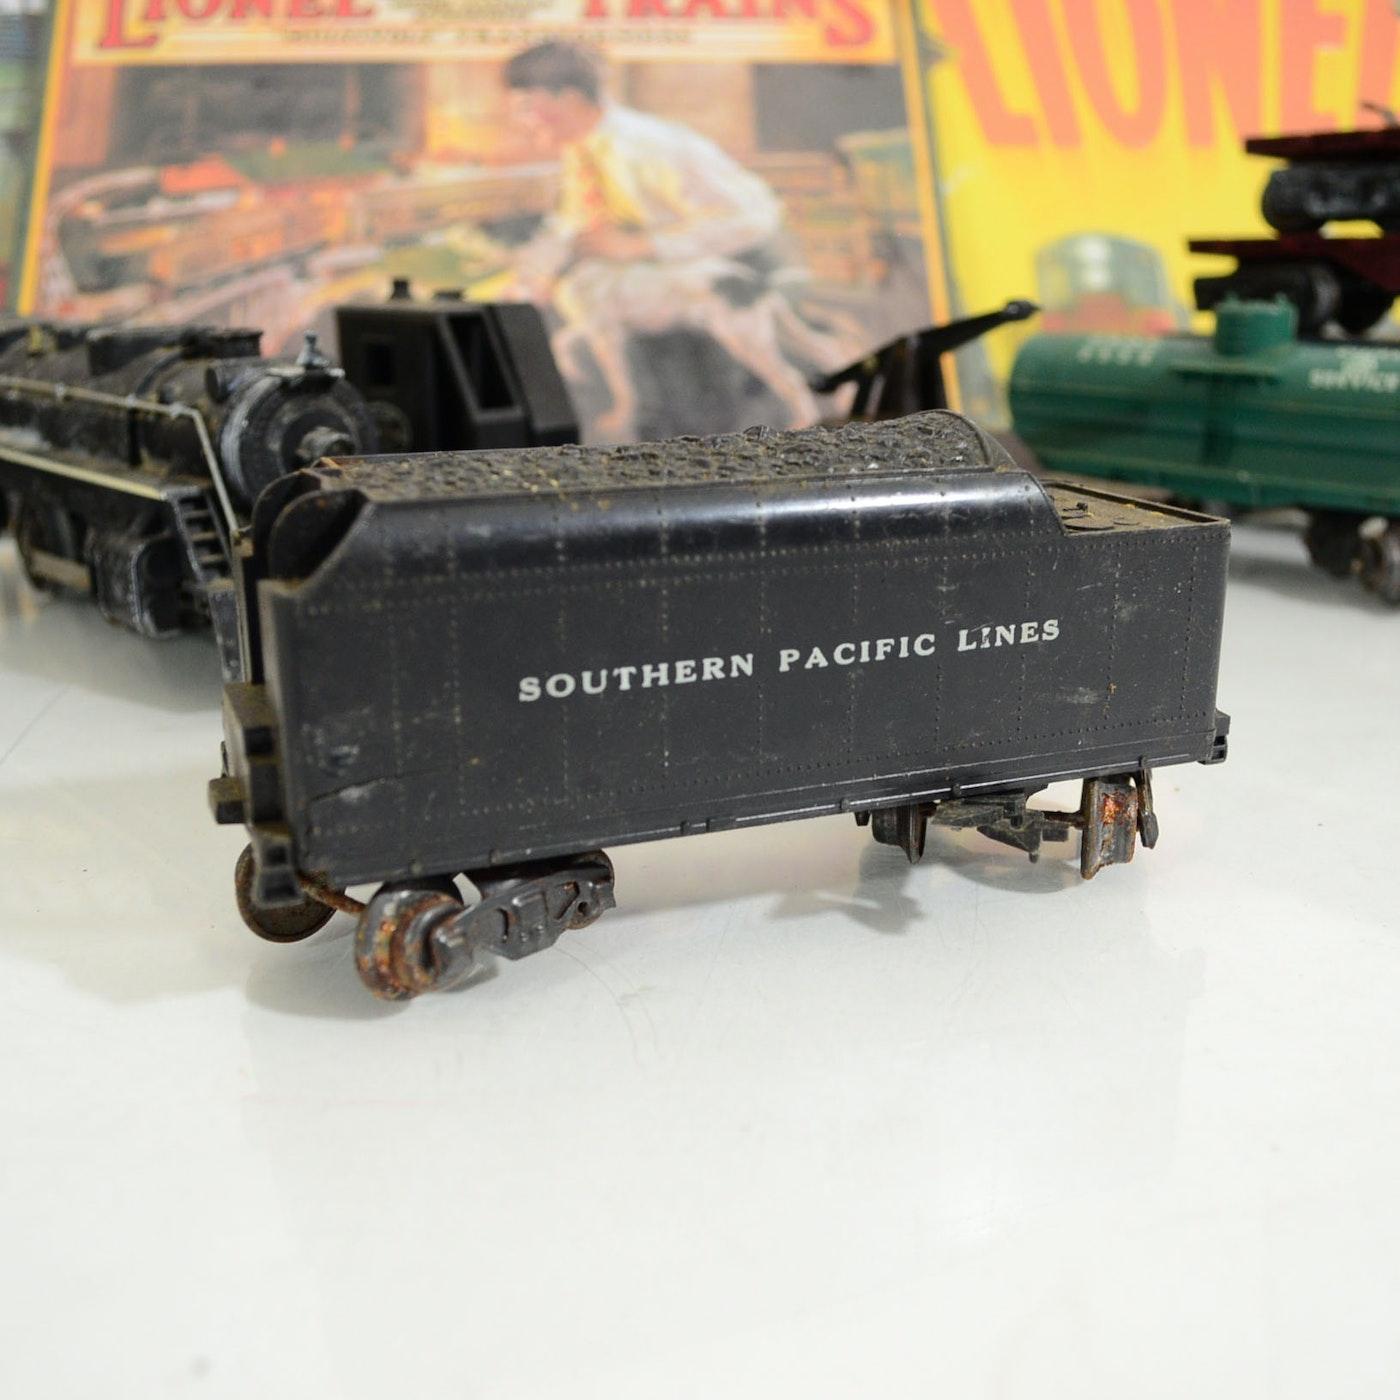 Marx Model Train Transformer - 0425